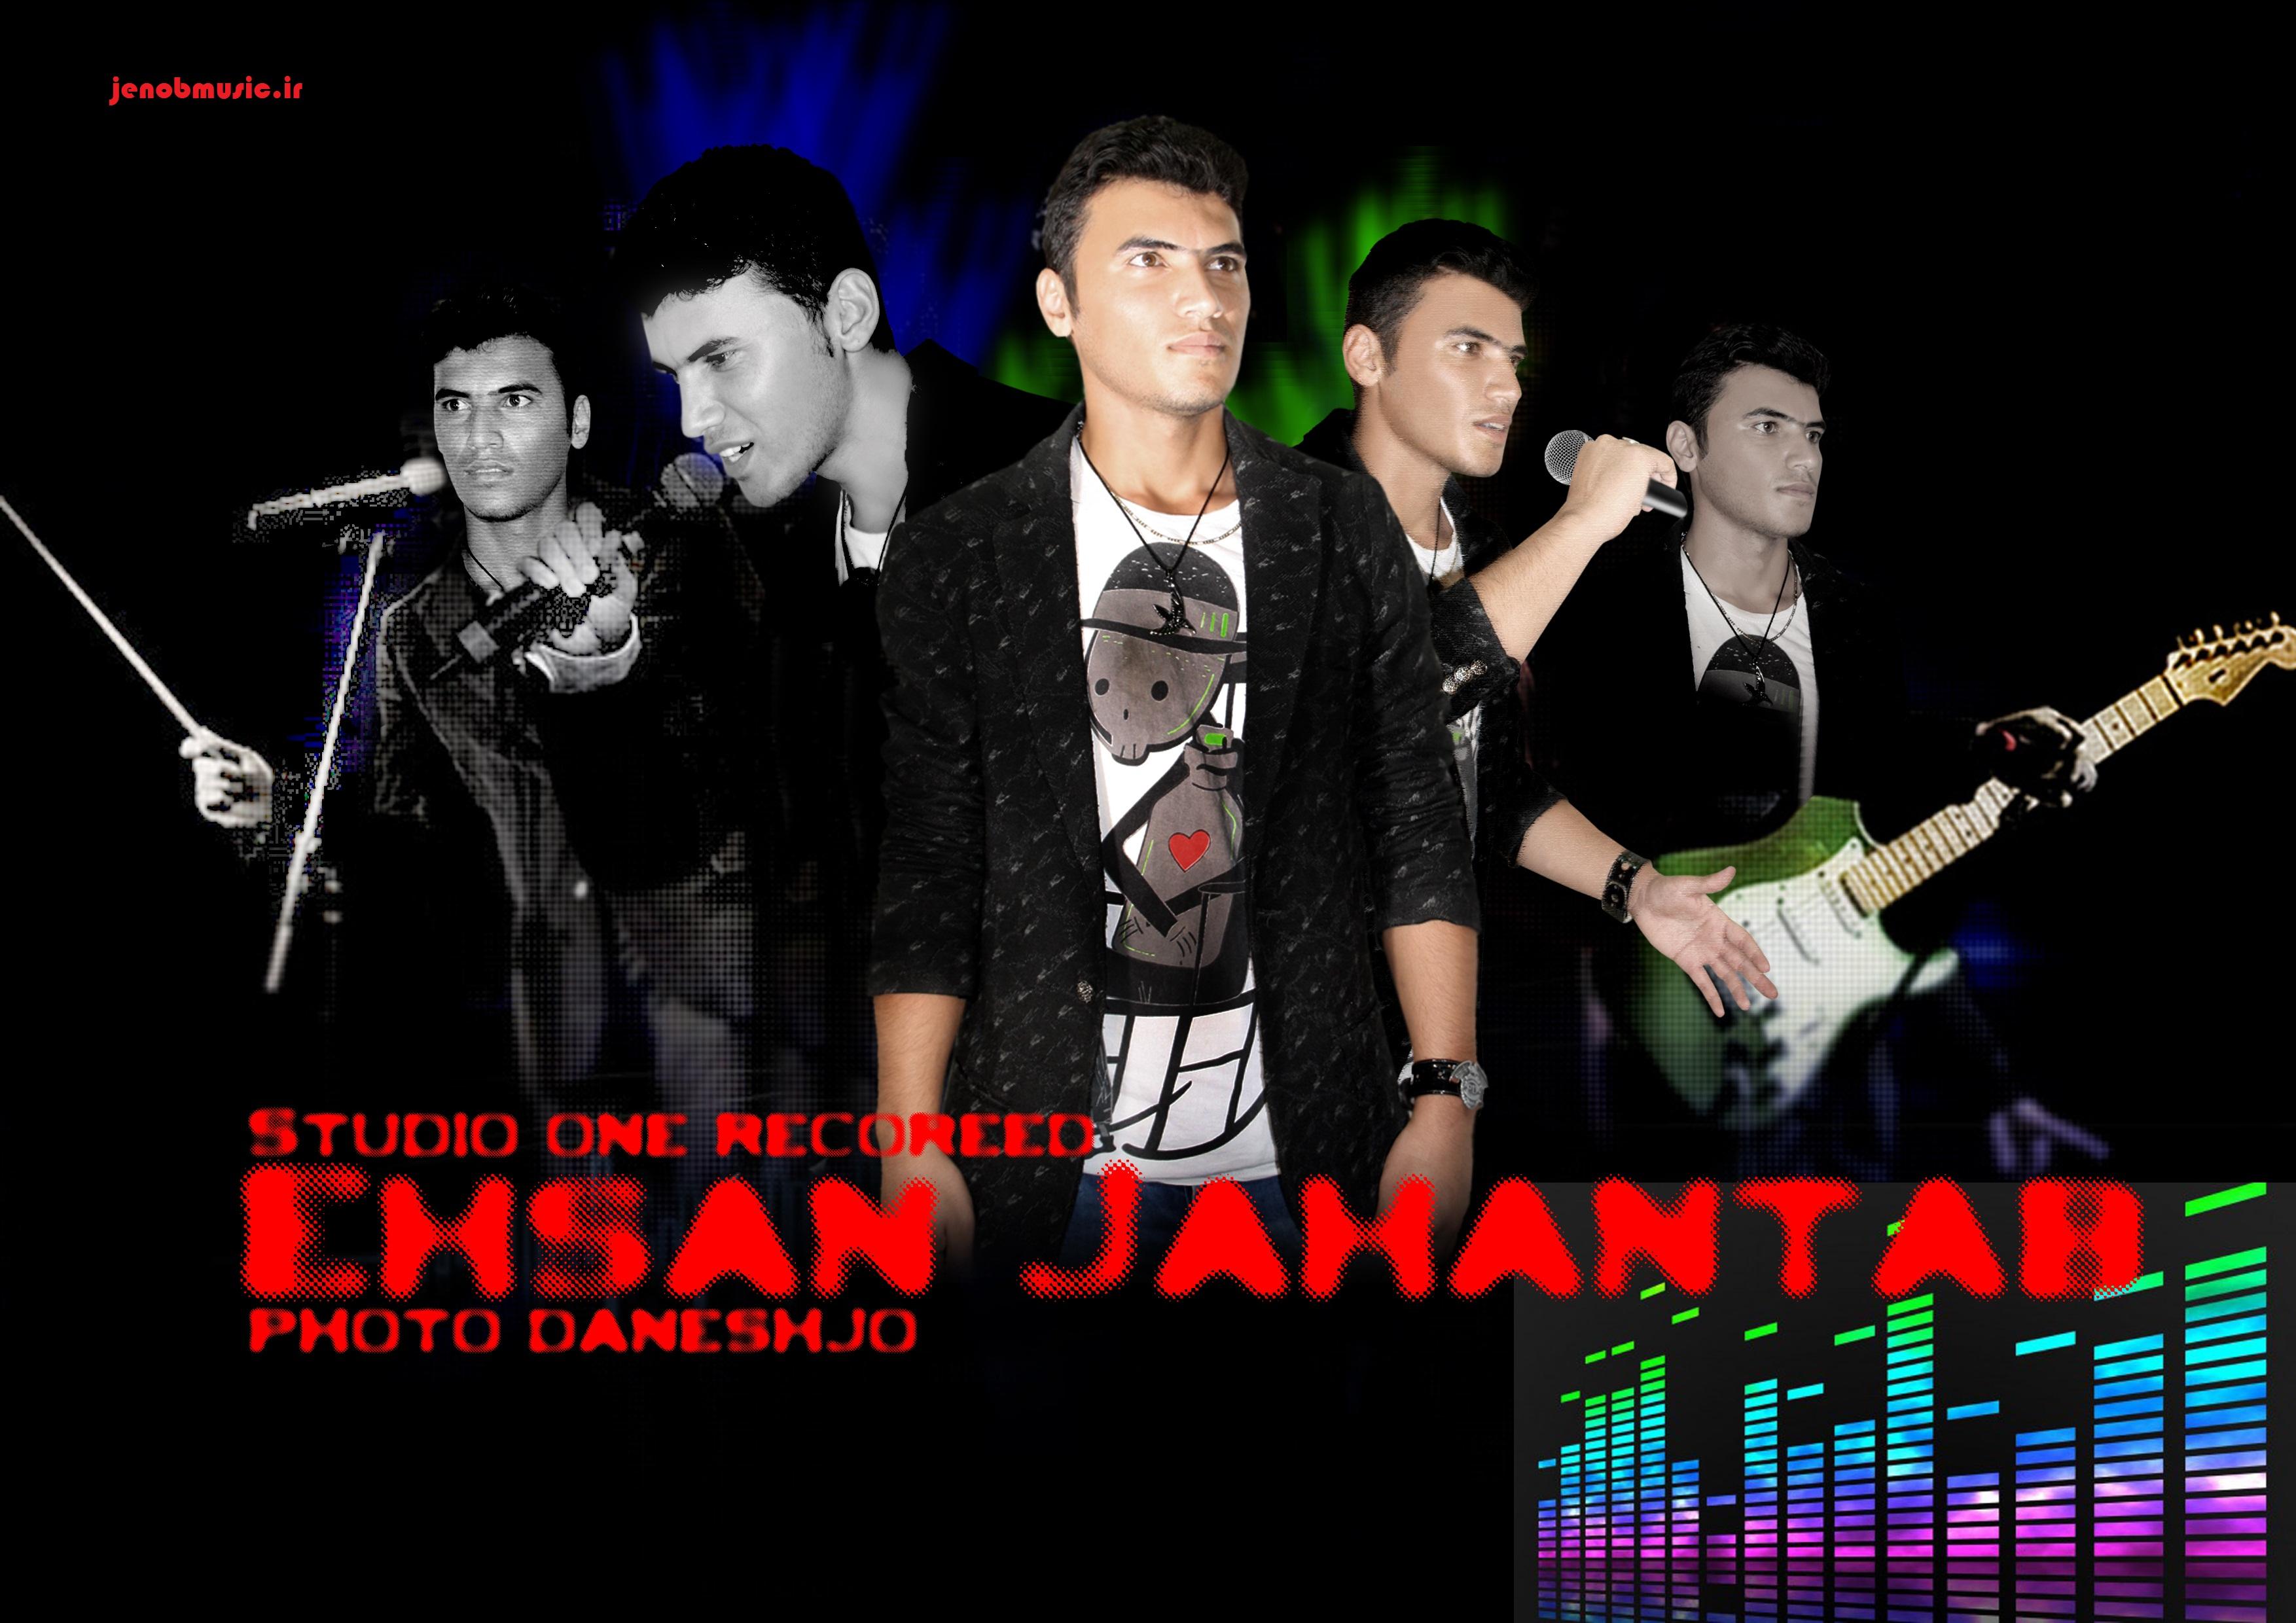 gozashte93-Ehsan Jahantab-Parsi-king-studio one recoreed- jenobmusic.ir